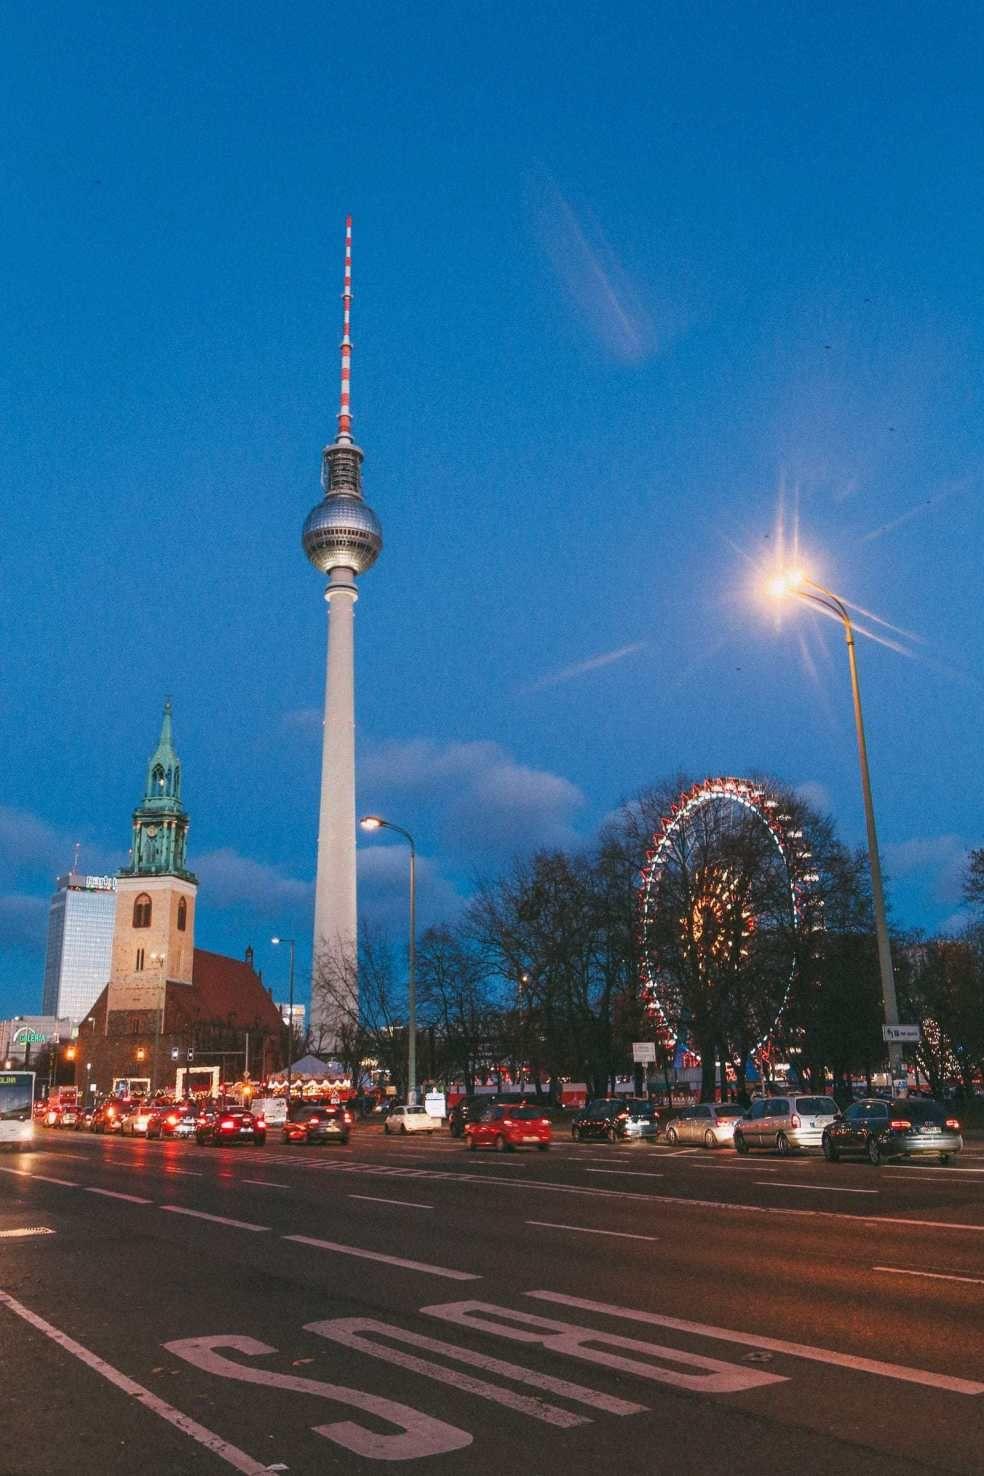 Christmas Market In Berlin, Germany Germany vacation